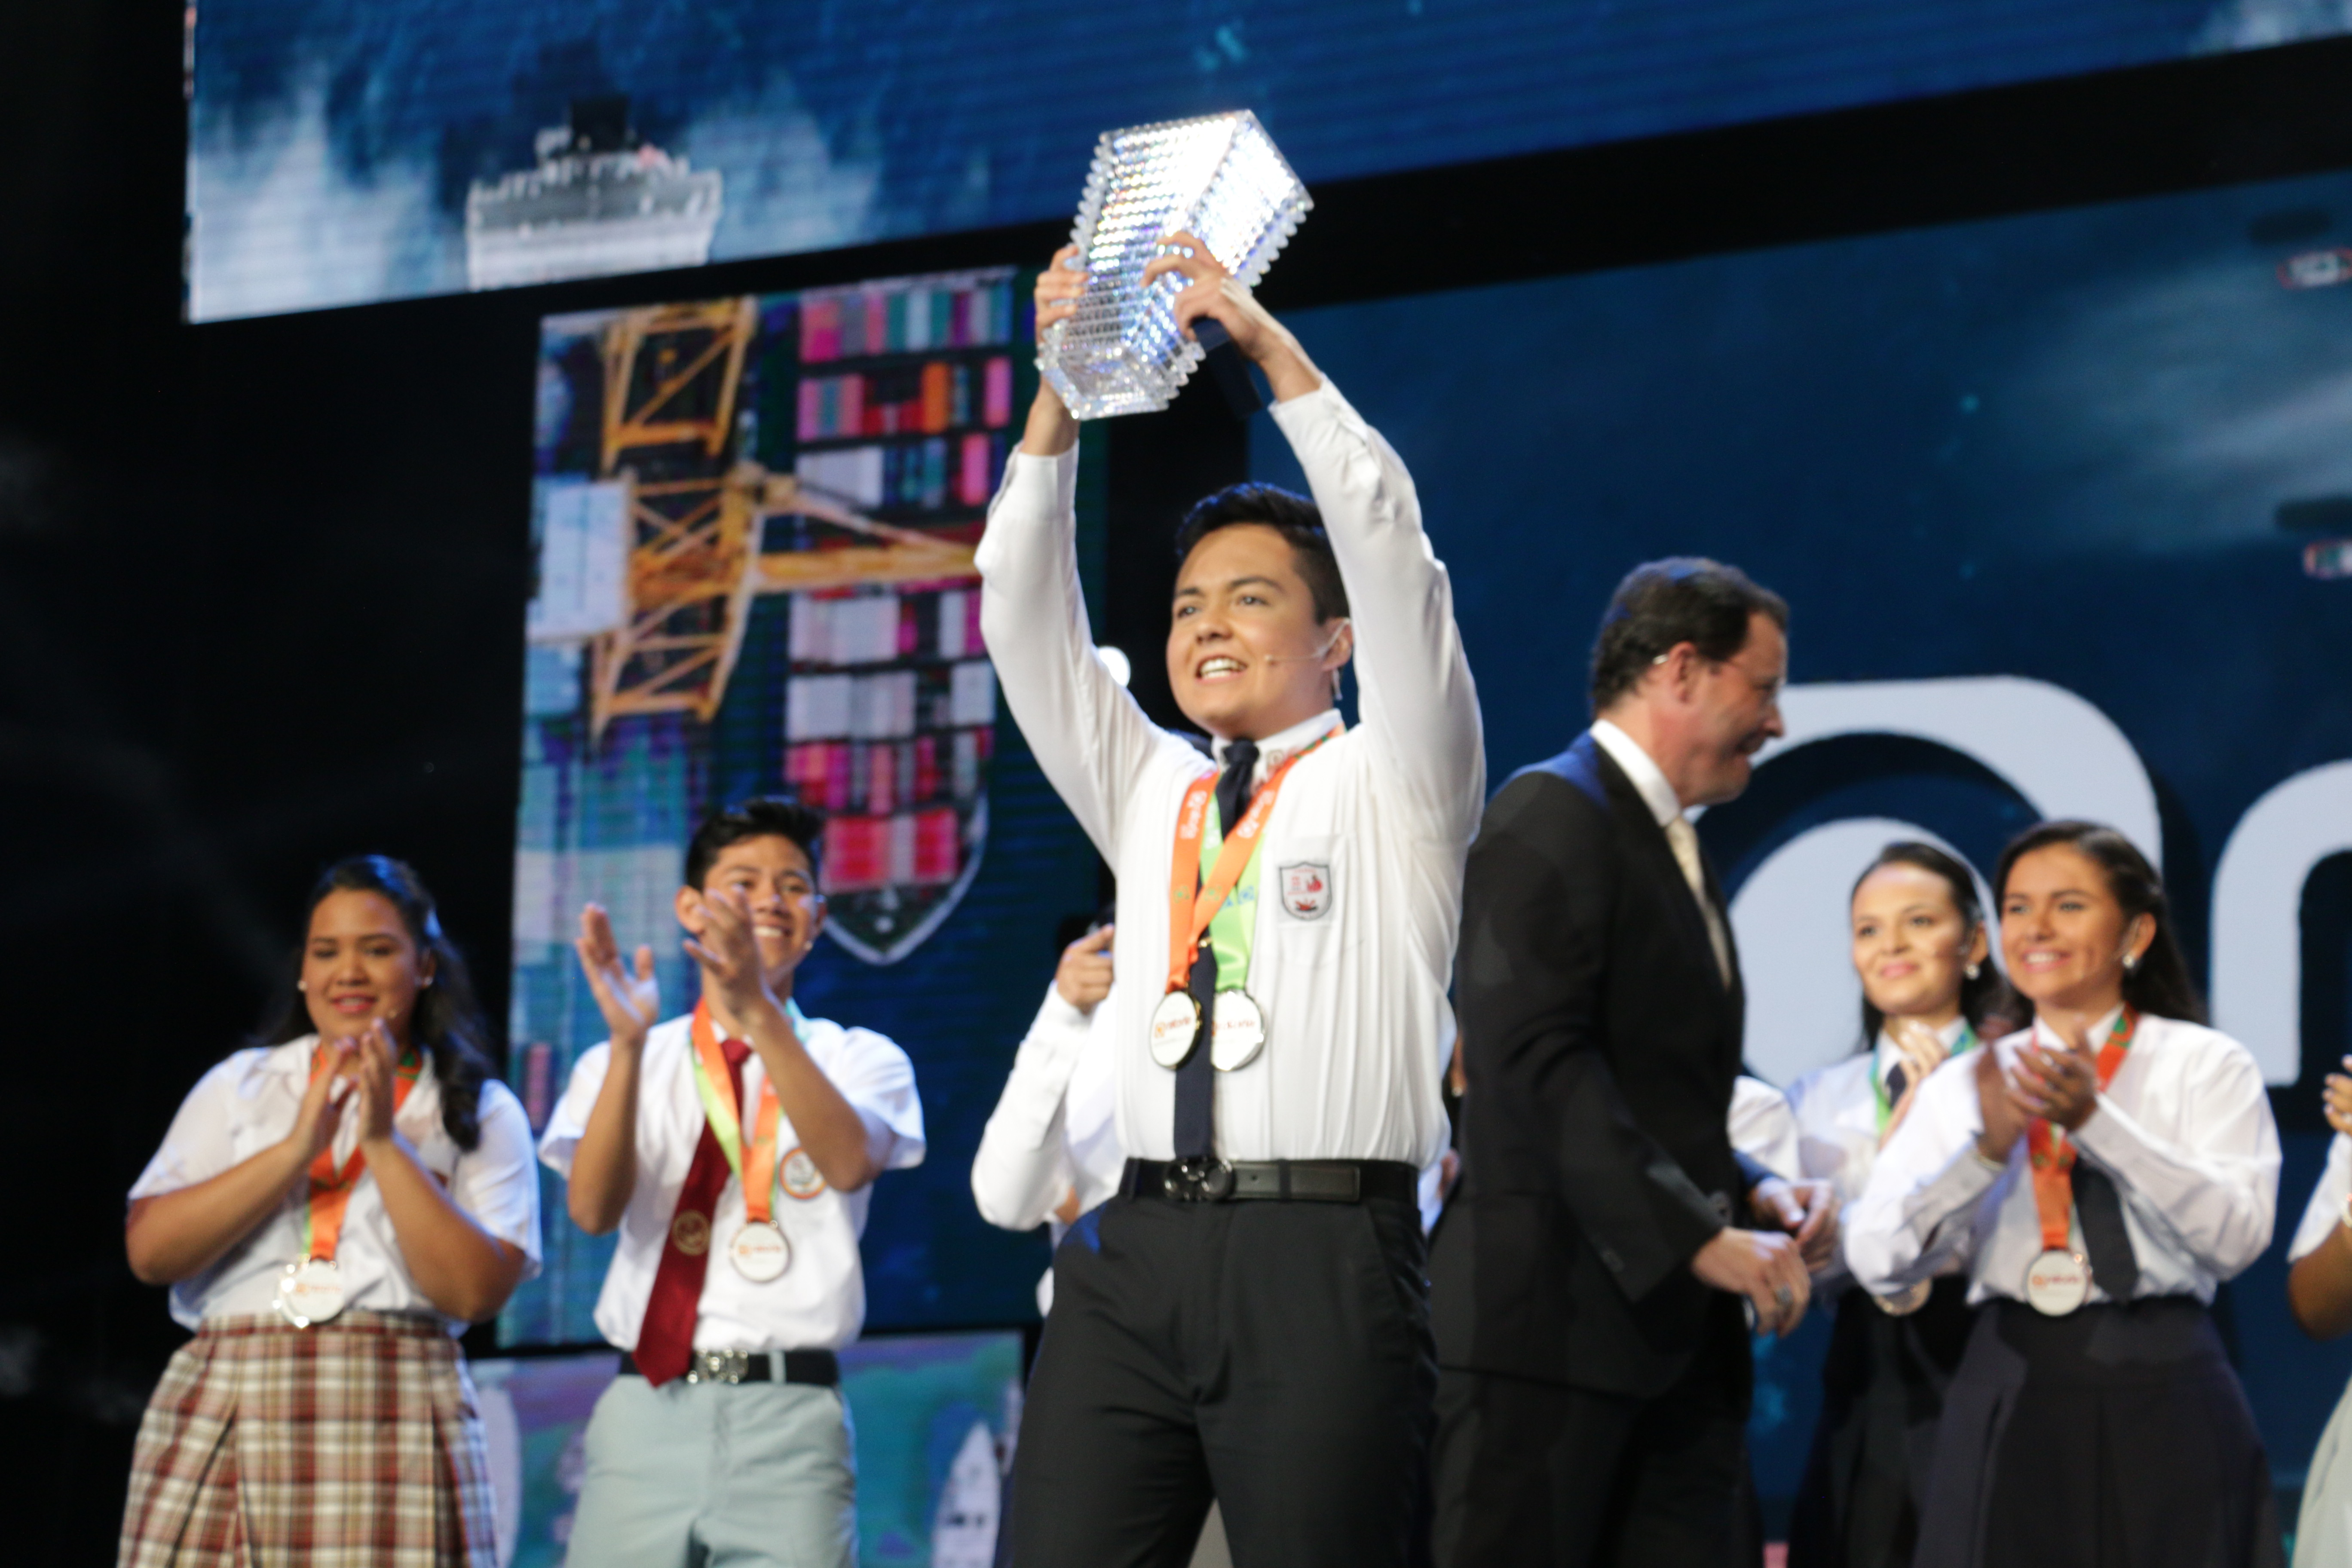 Chiriquí gana concurso de oratoria 2017